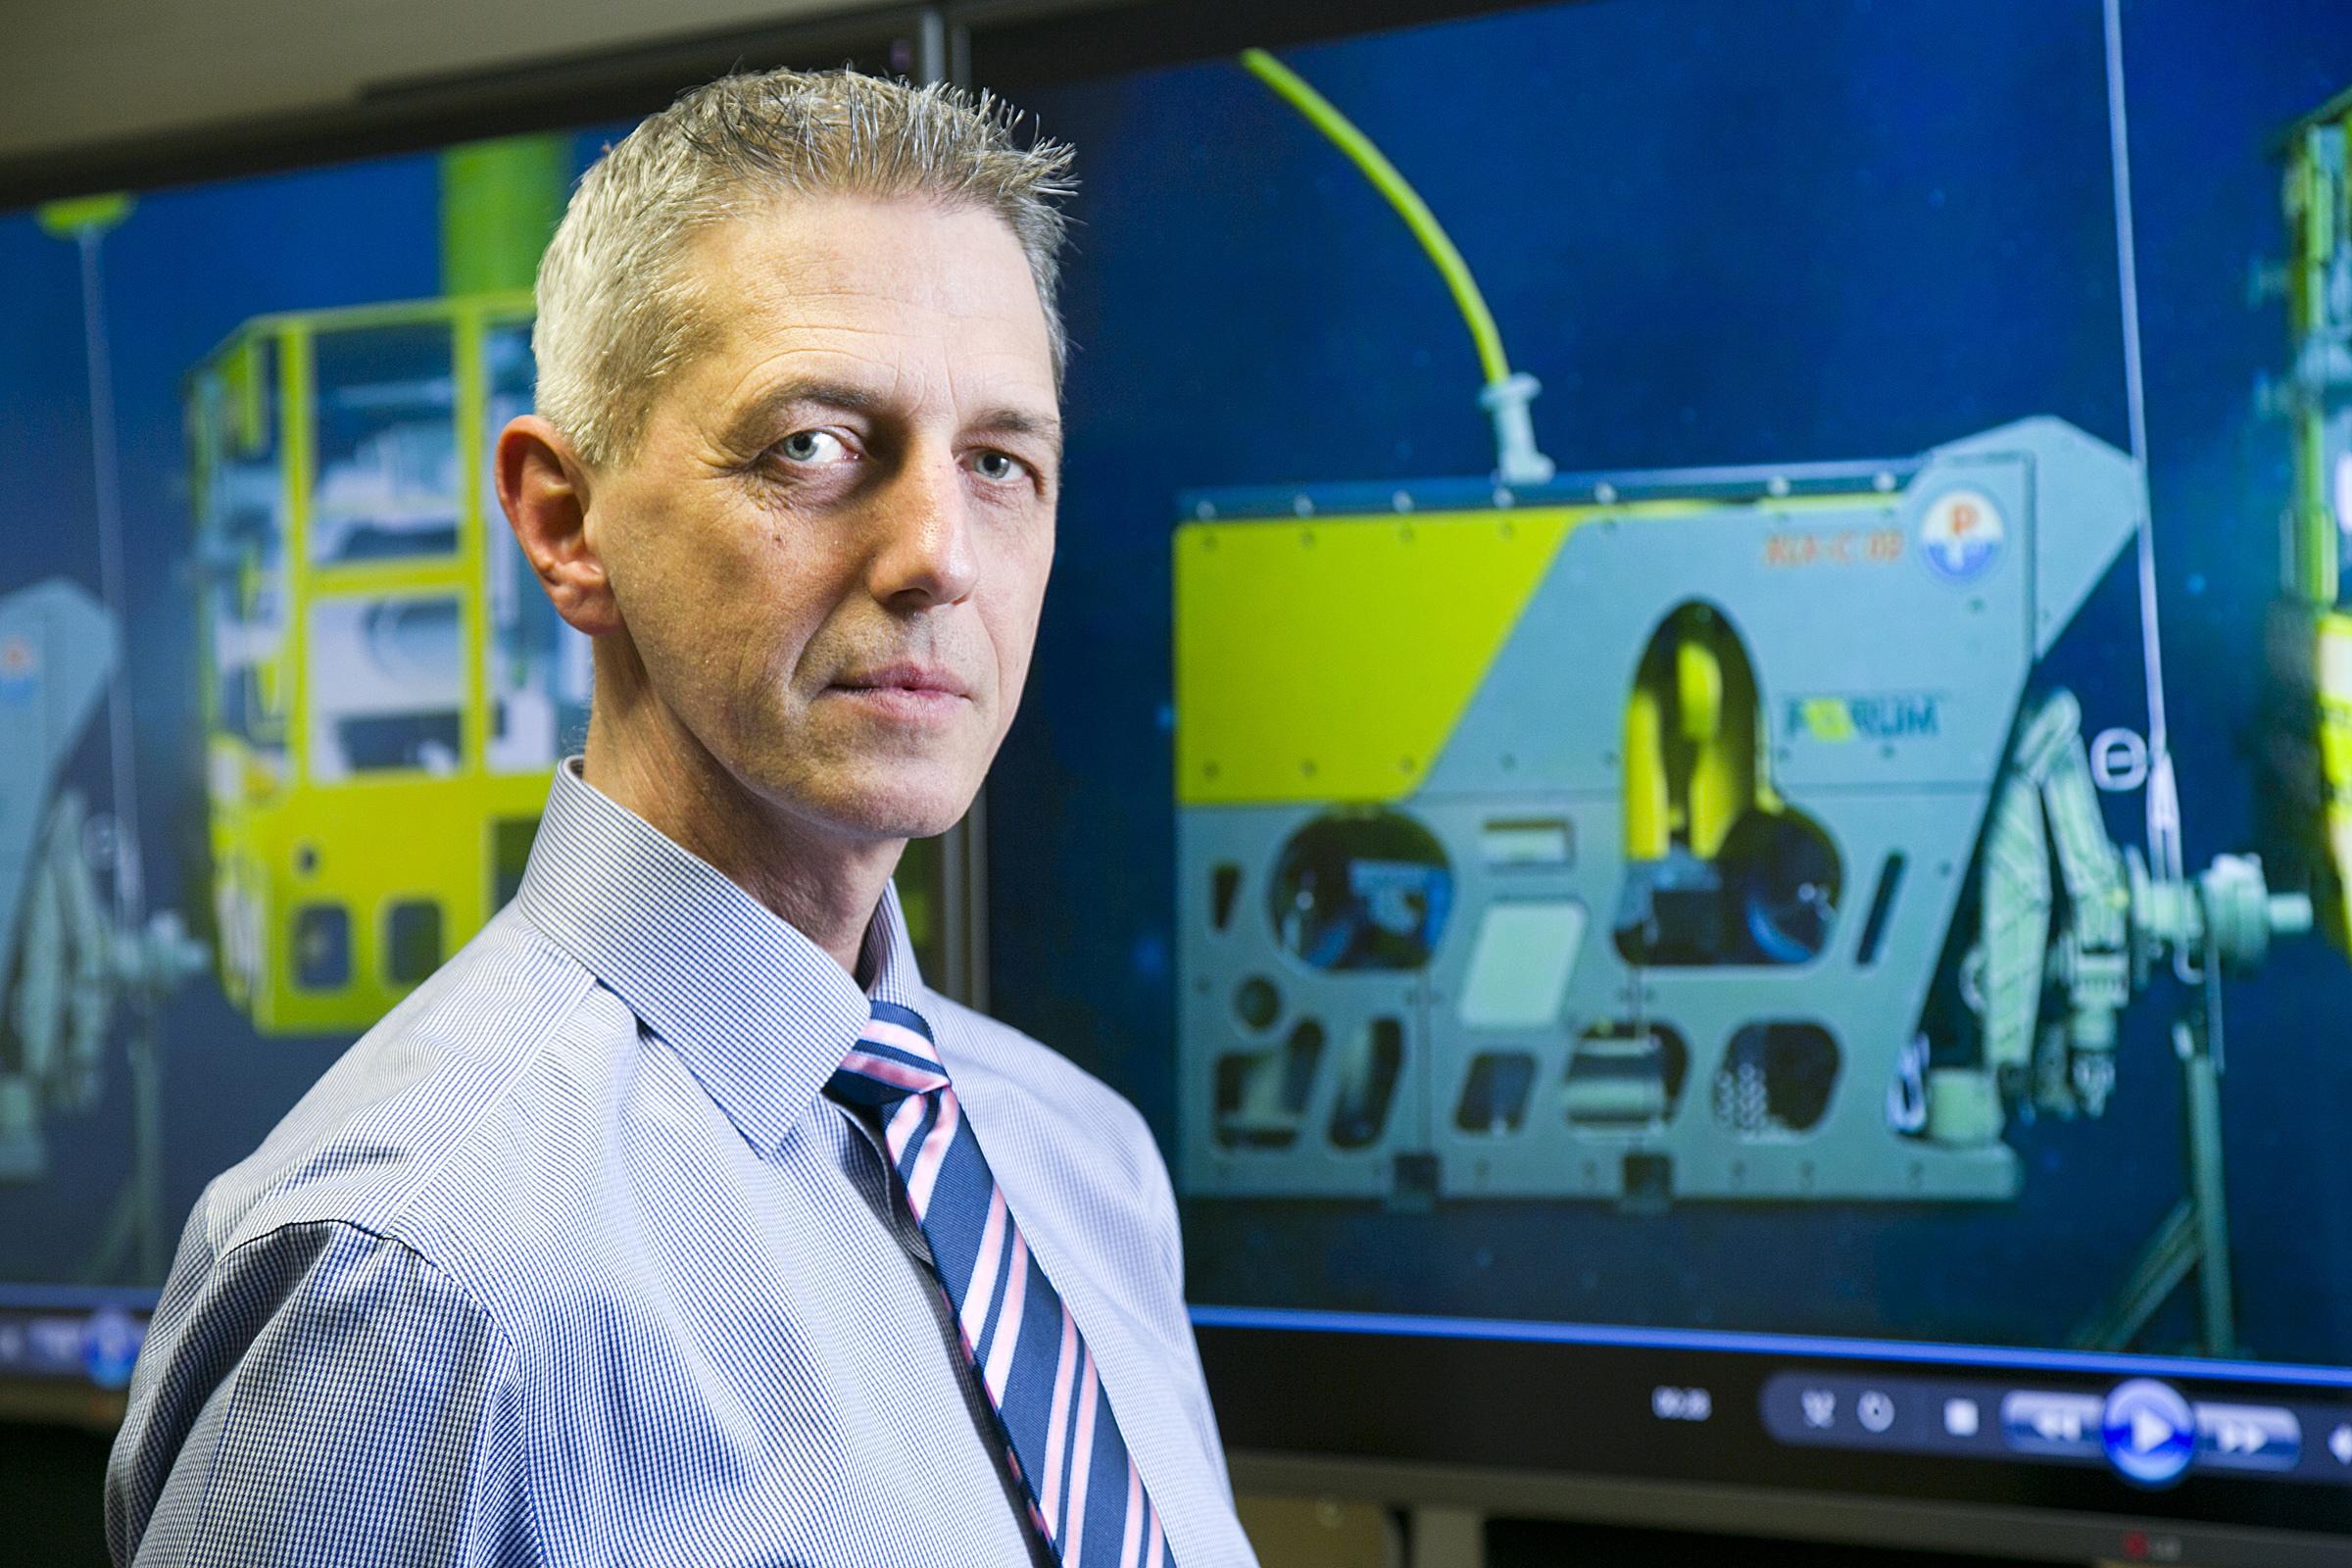 2.Forum Energy Technologies unveiled its latest model